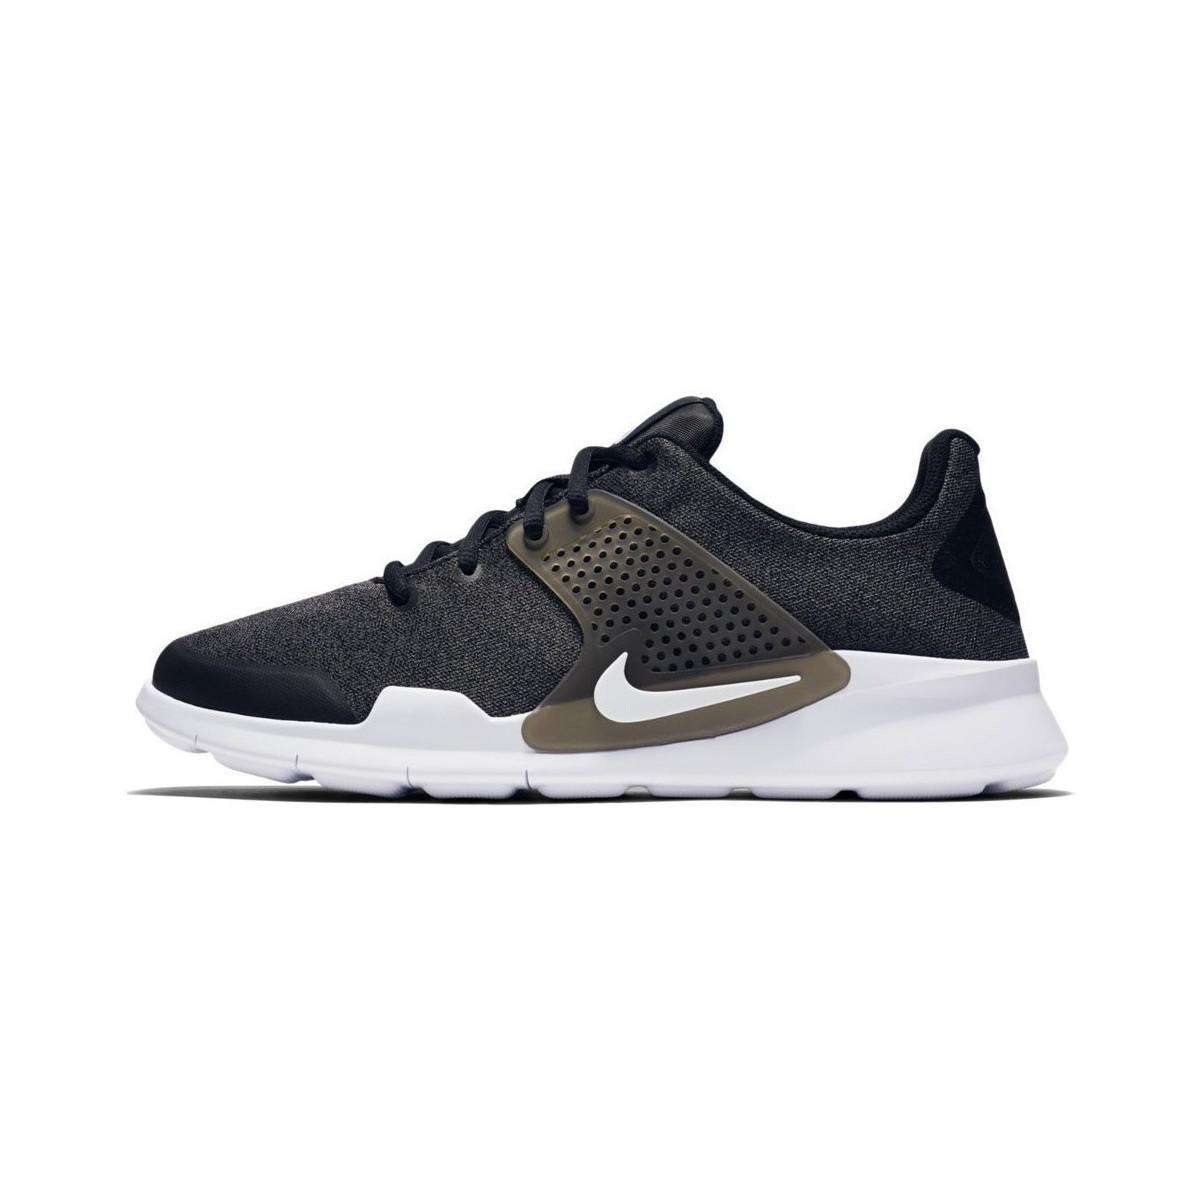 Nike ARROWZ Casual Lightweight Mens Adult Running Shoes Trainers  Dark Grey